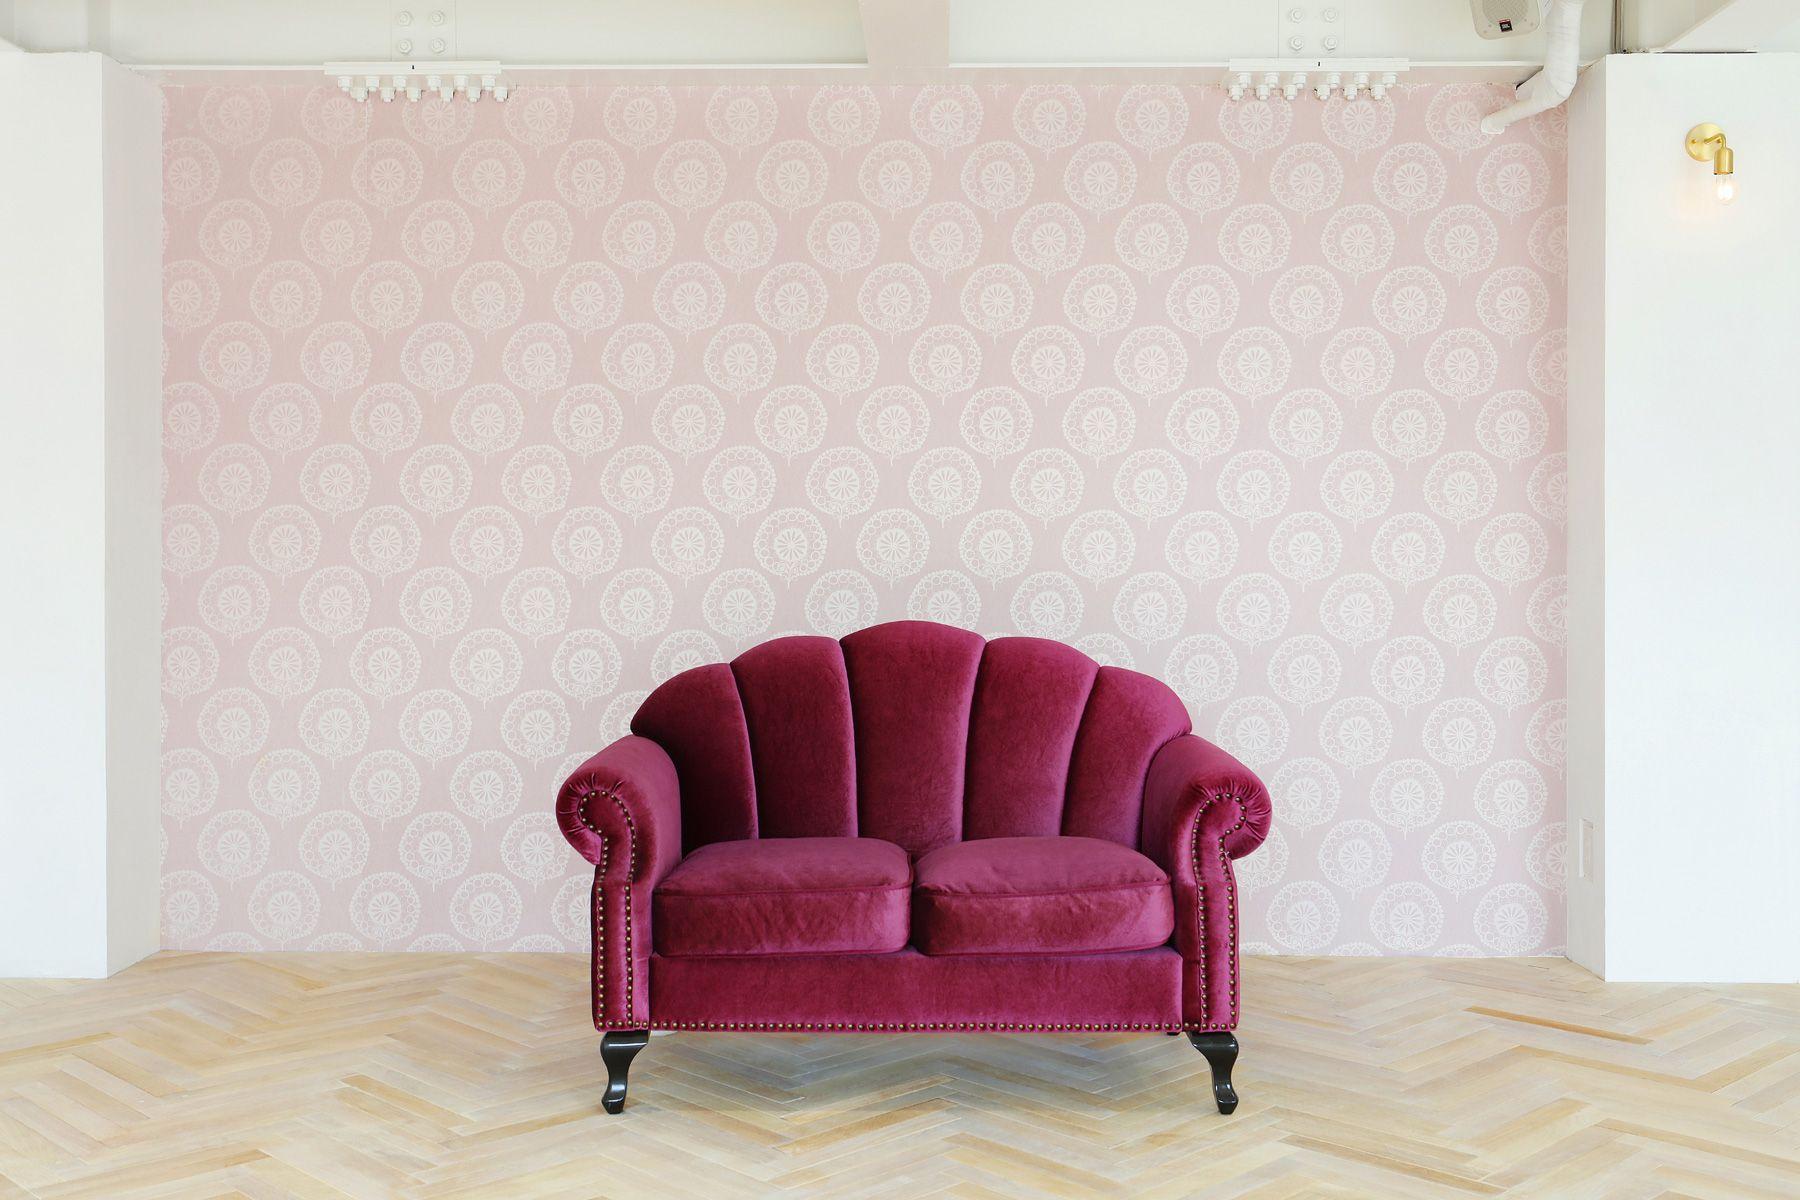 studio limll(スタジオ リムル)2F右側ピンクの壁紙